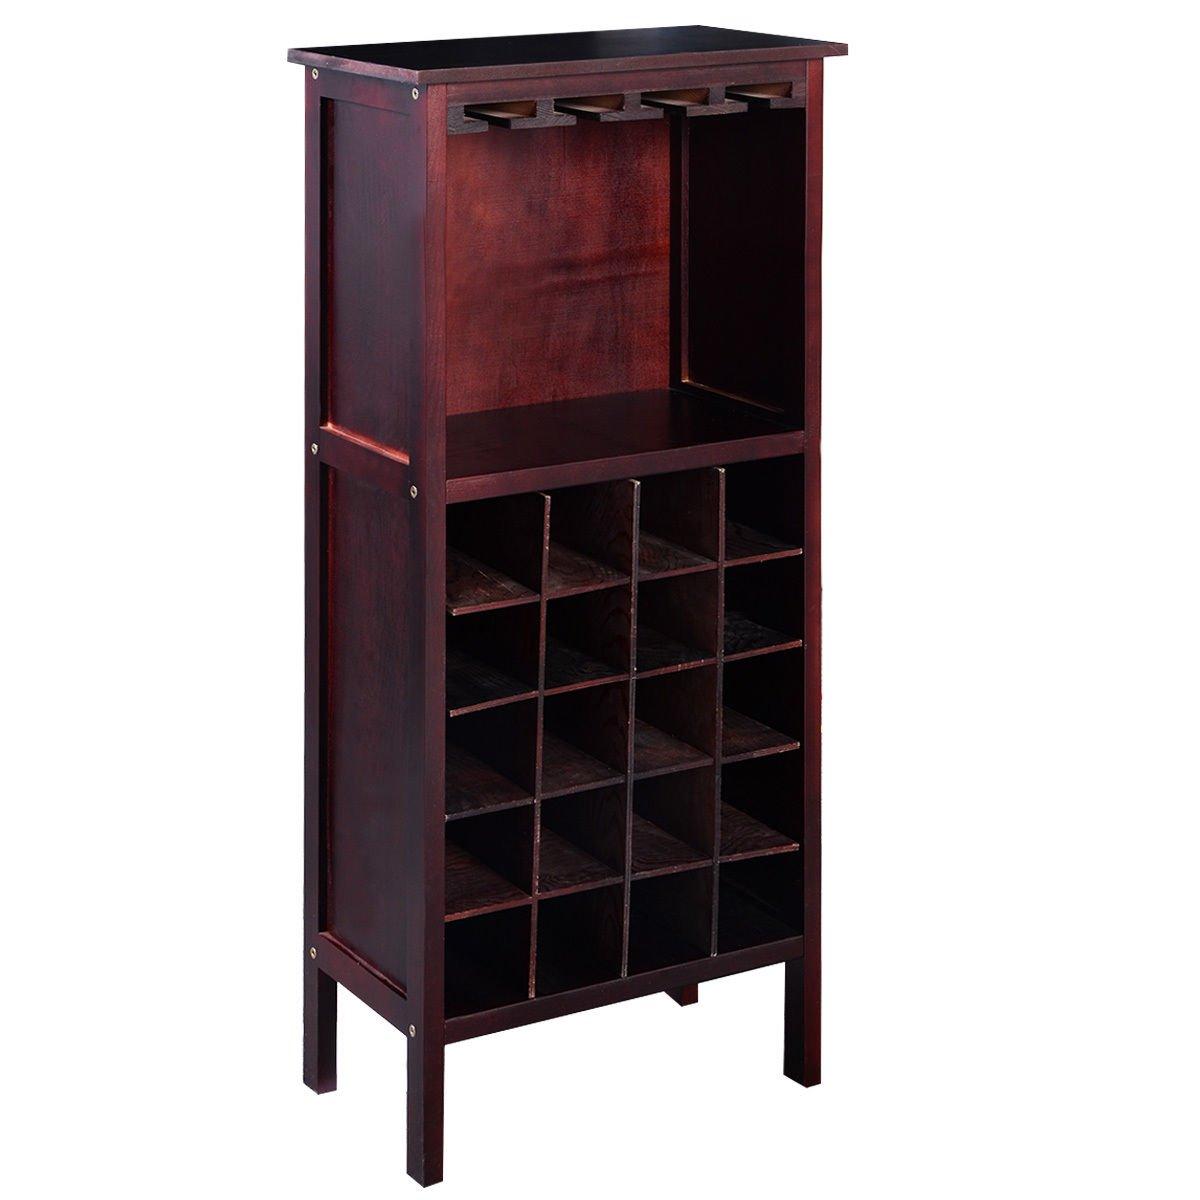 New Wine Wooden Cabinet Bottle Holder Storage Kitchen Home Bar w/ Glass Rack by Unknown (Image #4)